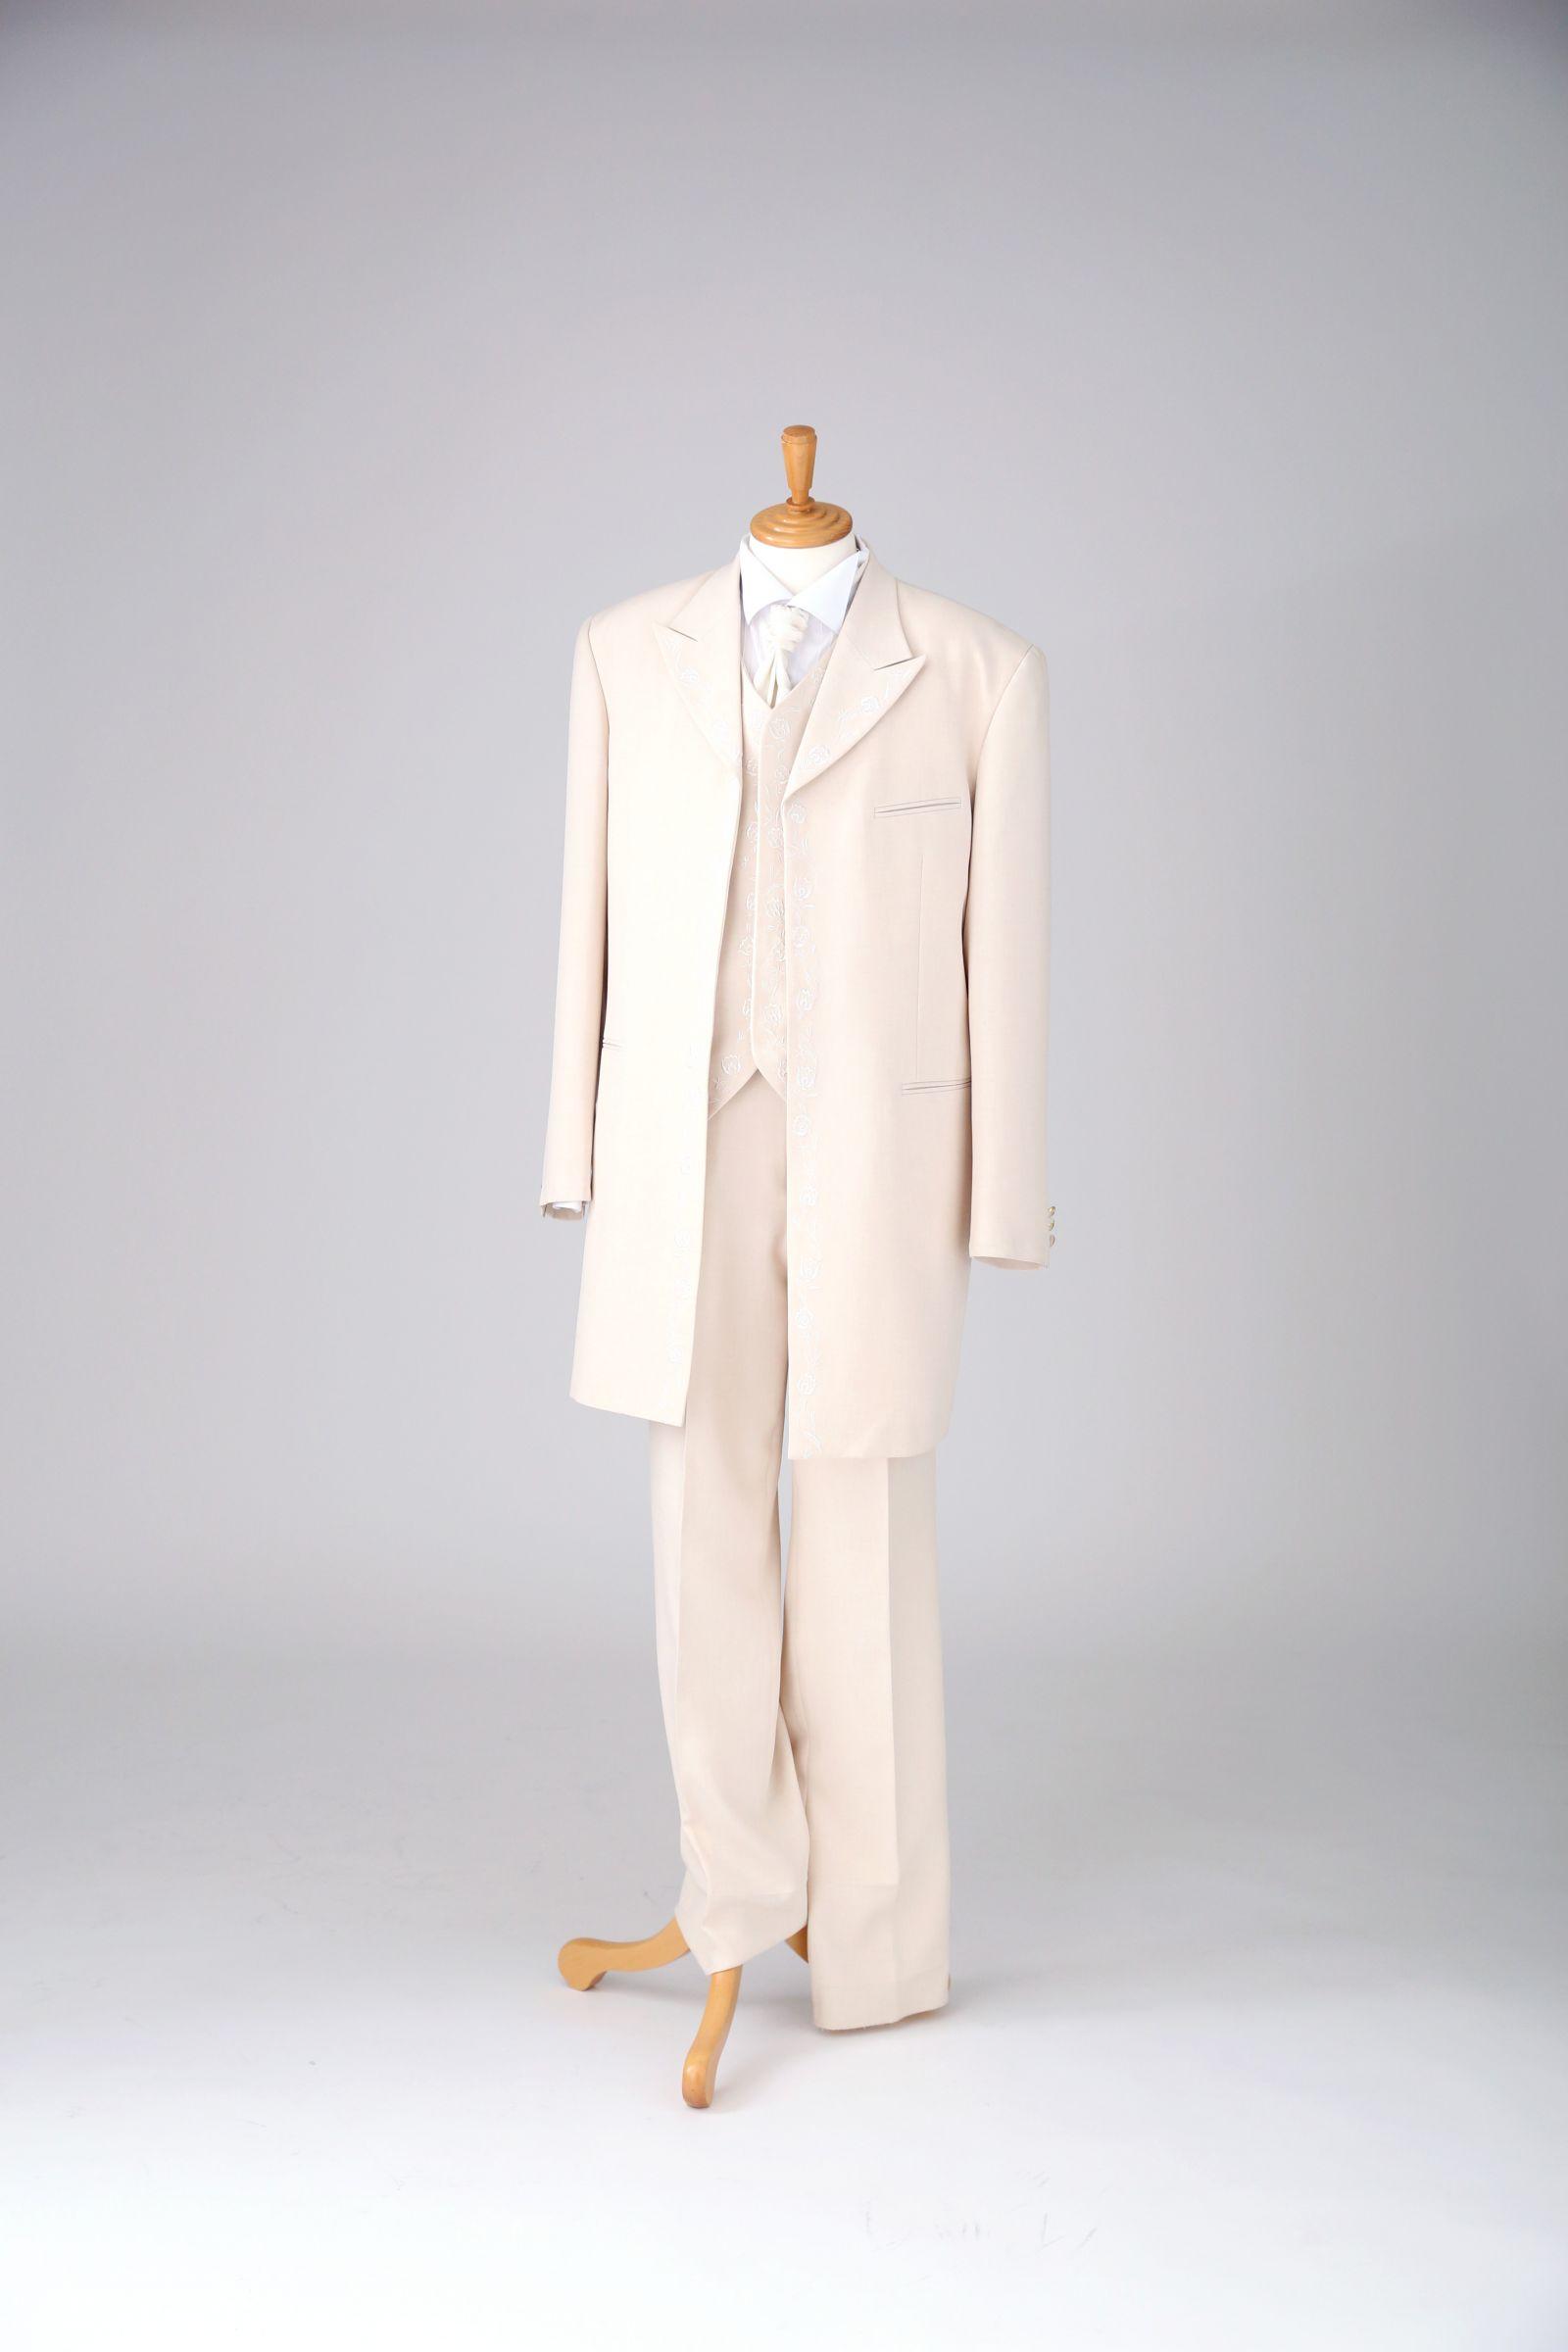 姫路店 男性衣装 T012 L